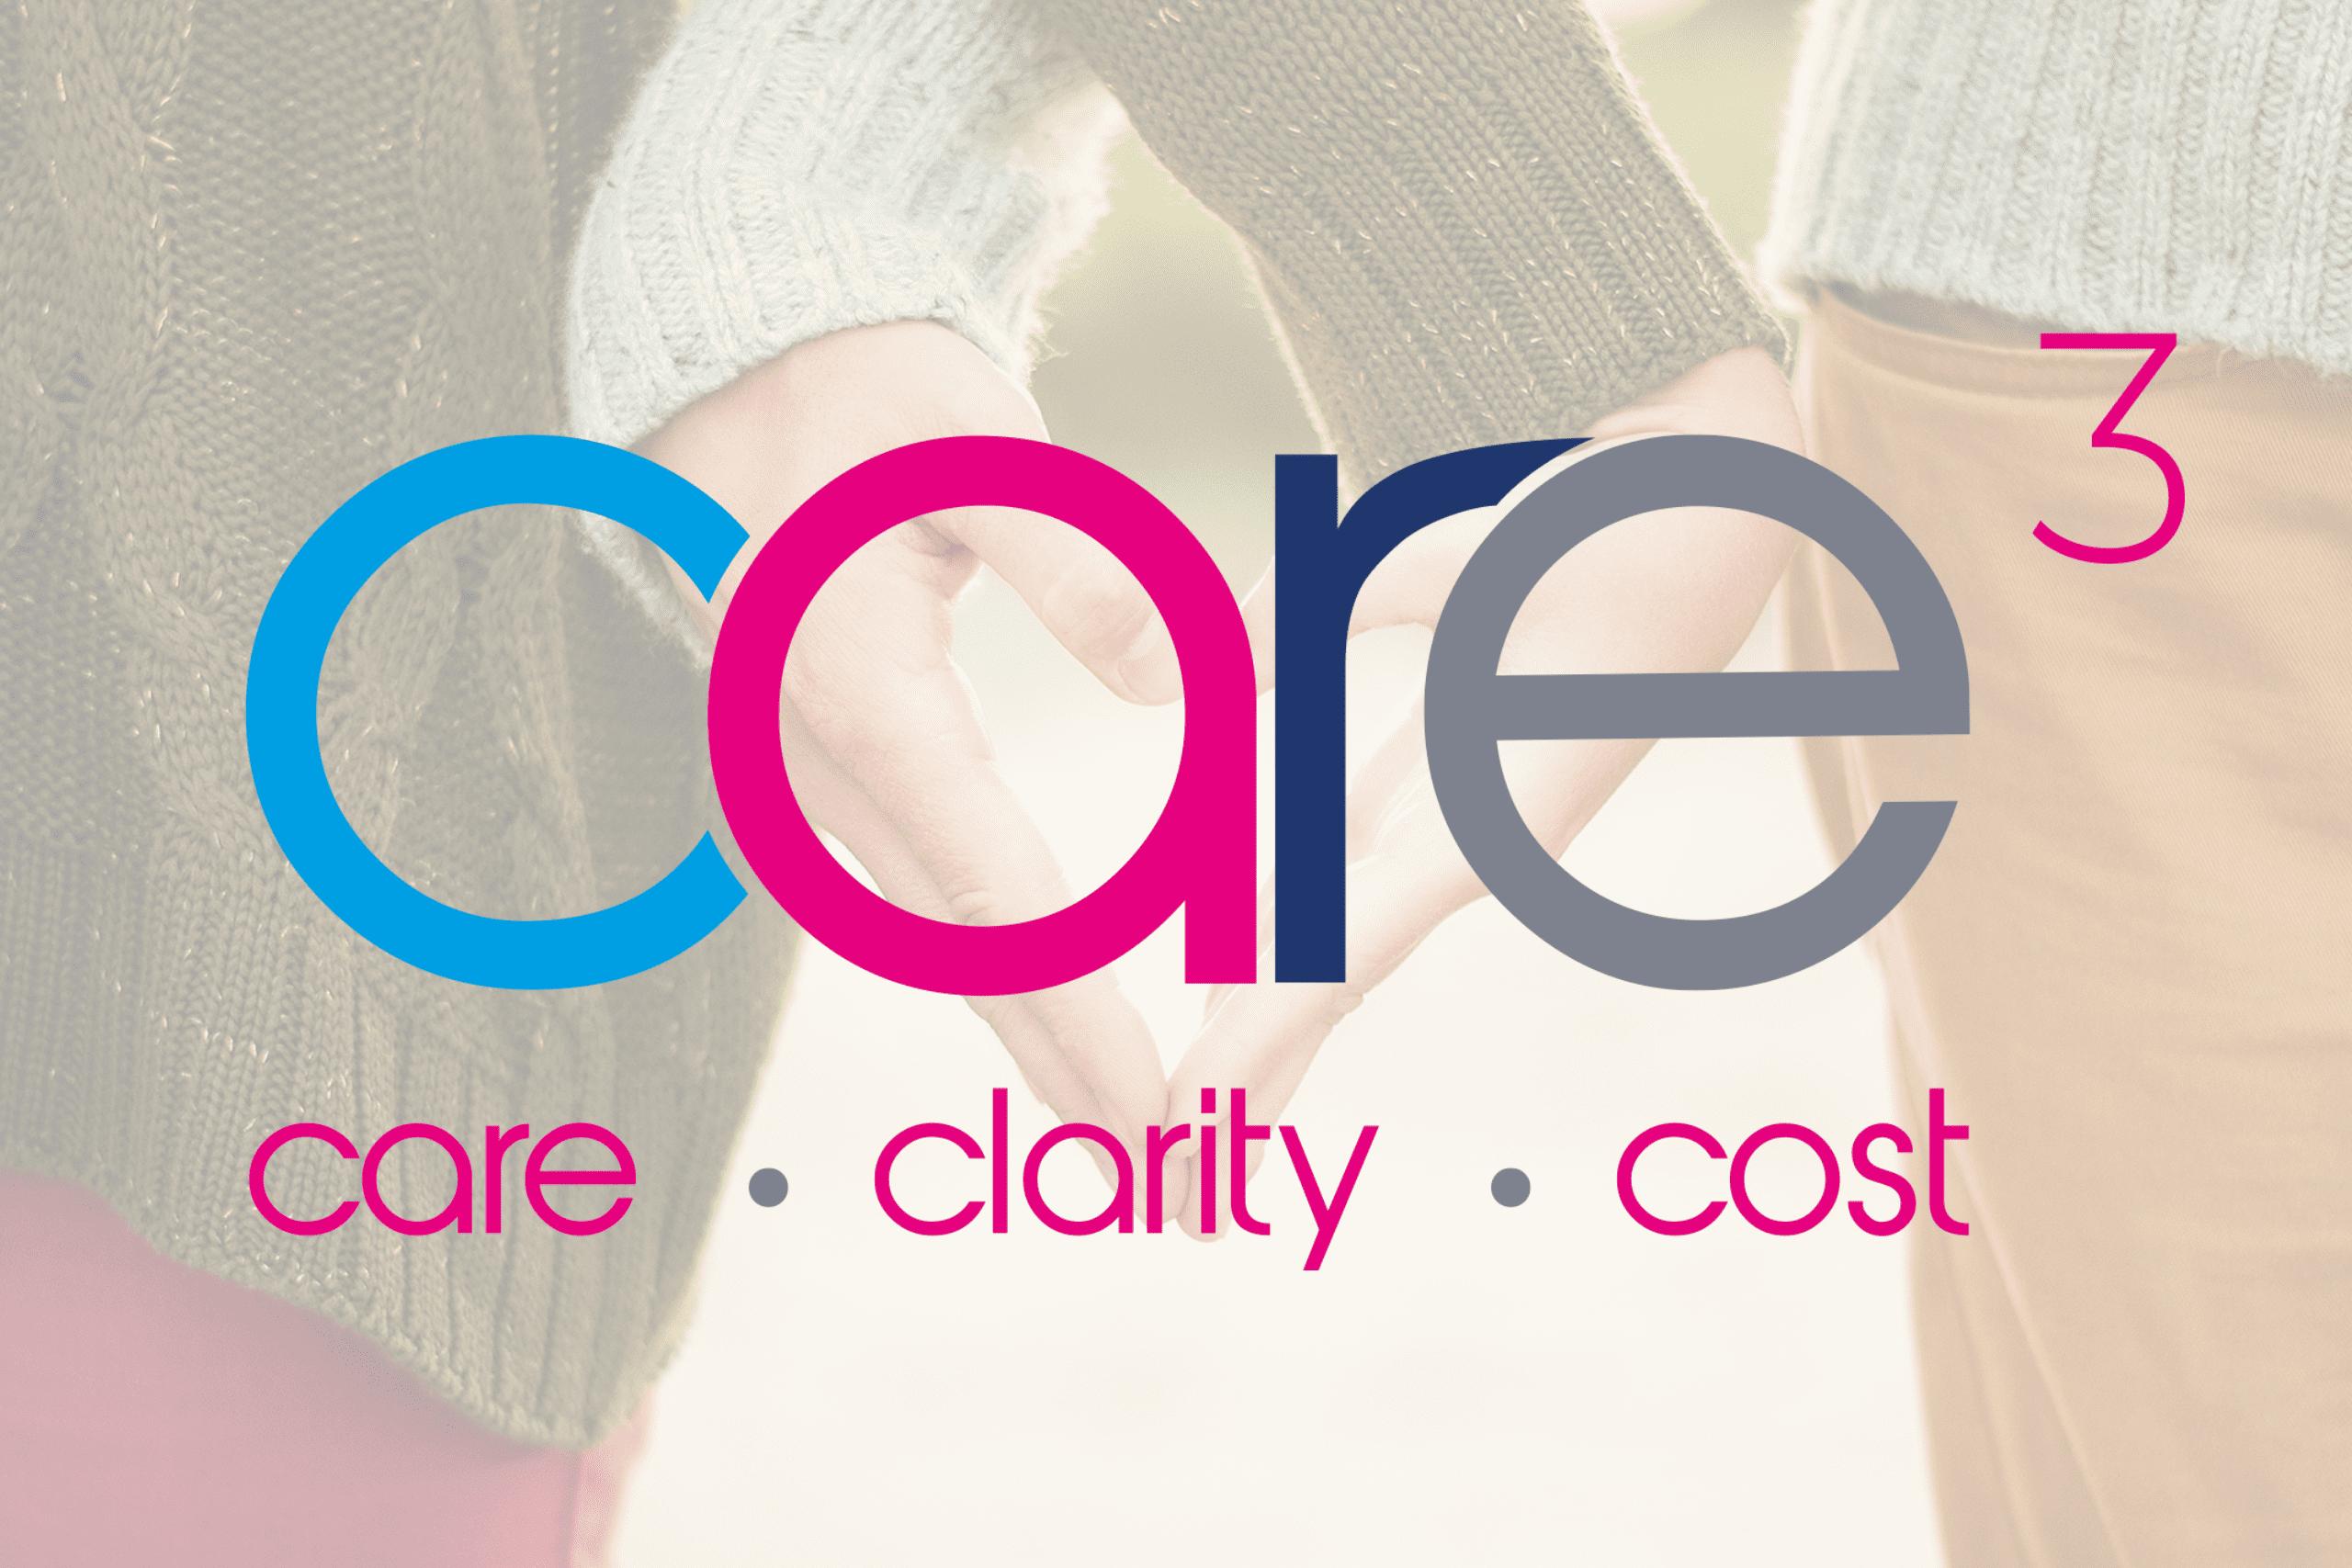 introducing carecubed blog image